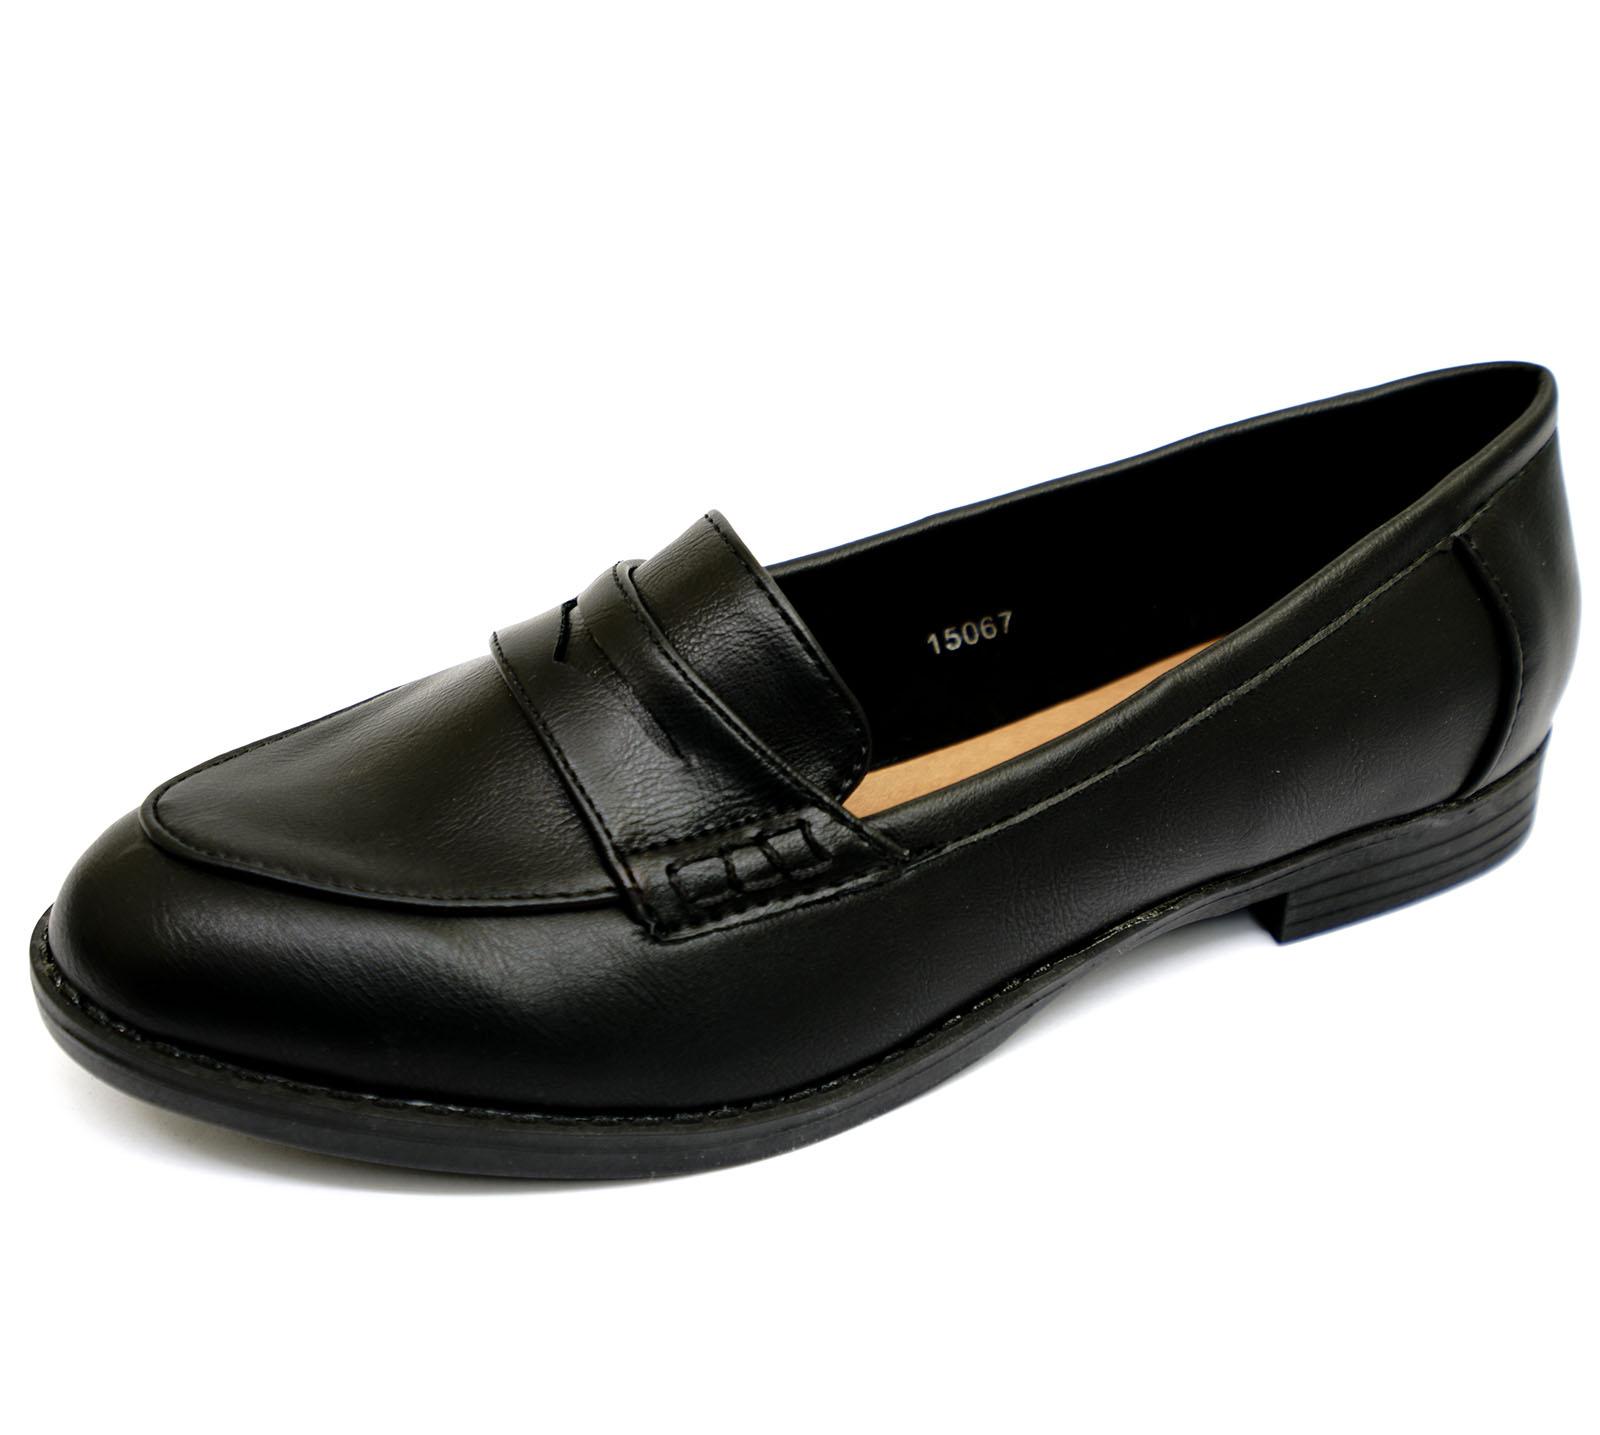 LADIES BLACK SLIP-ON LOAFERS MOCCASIN